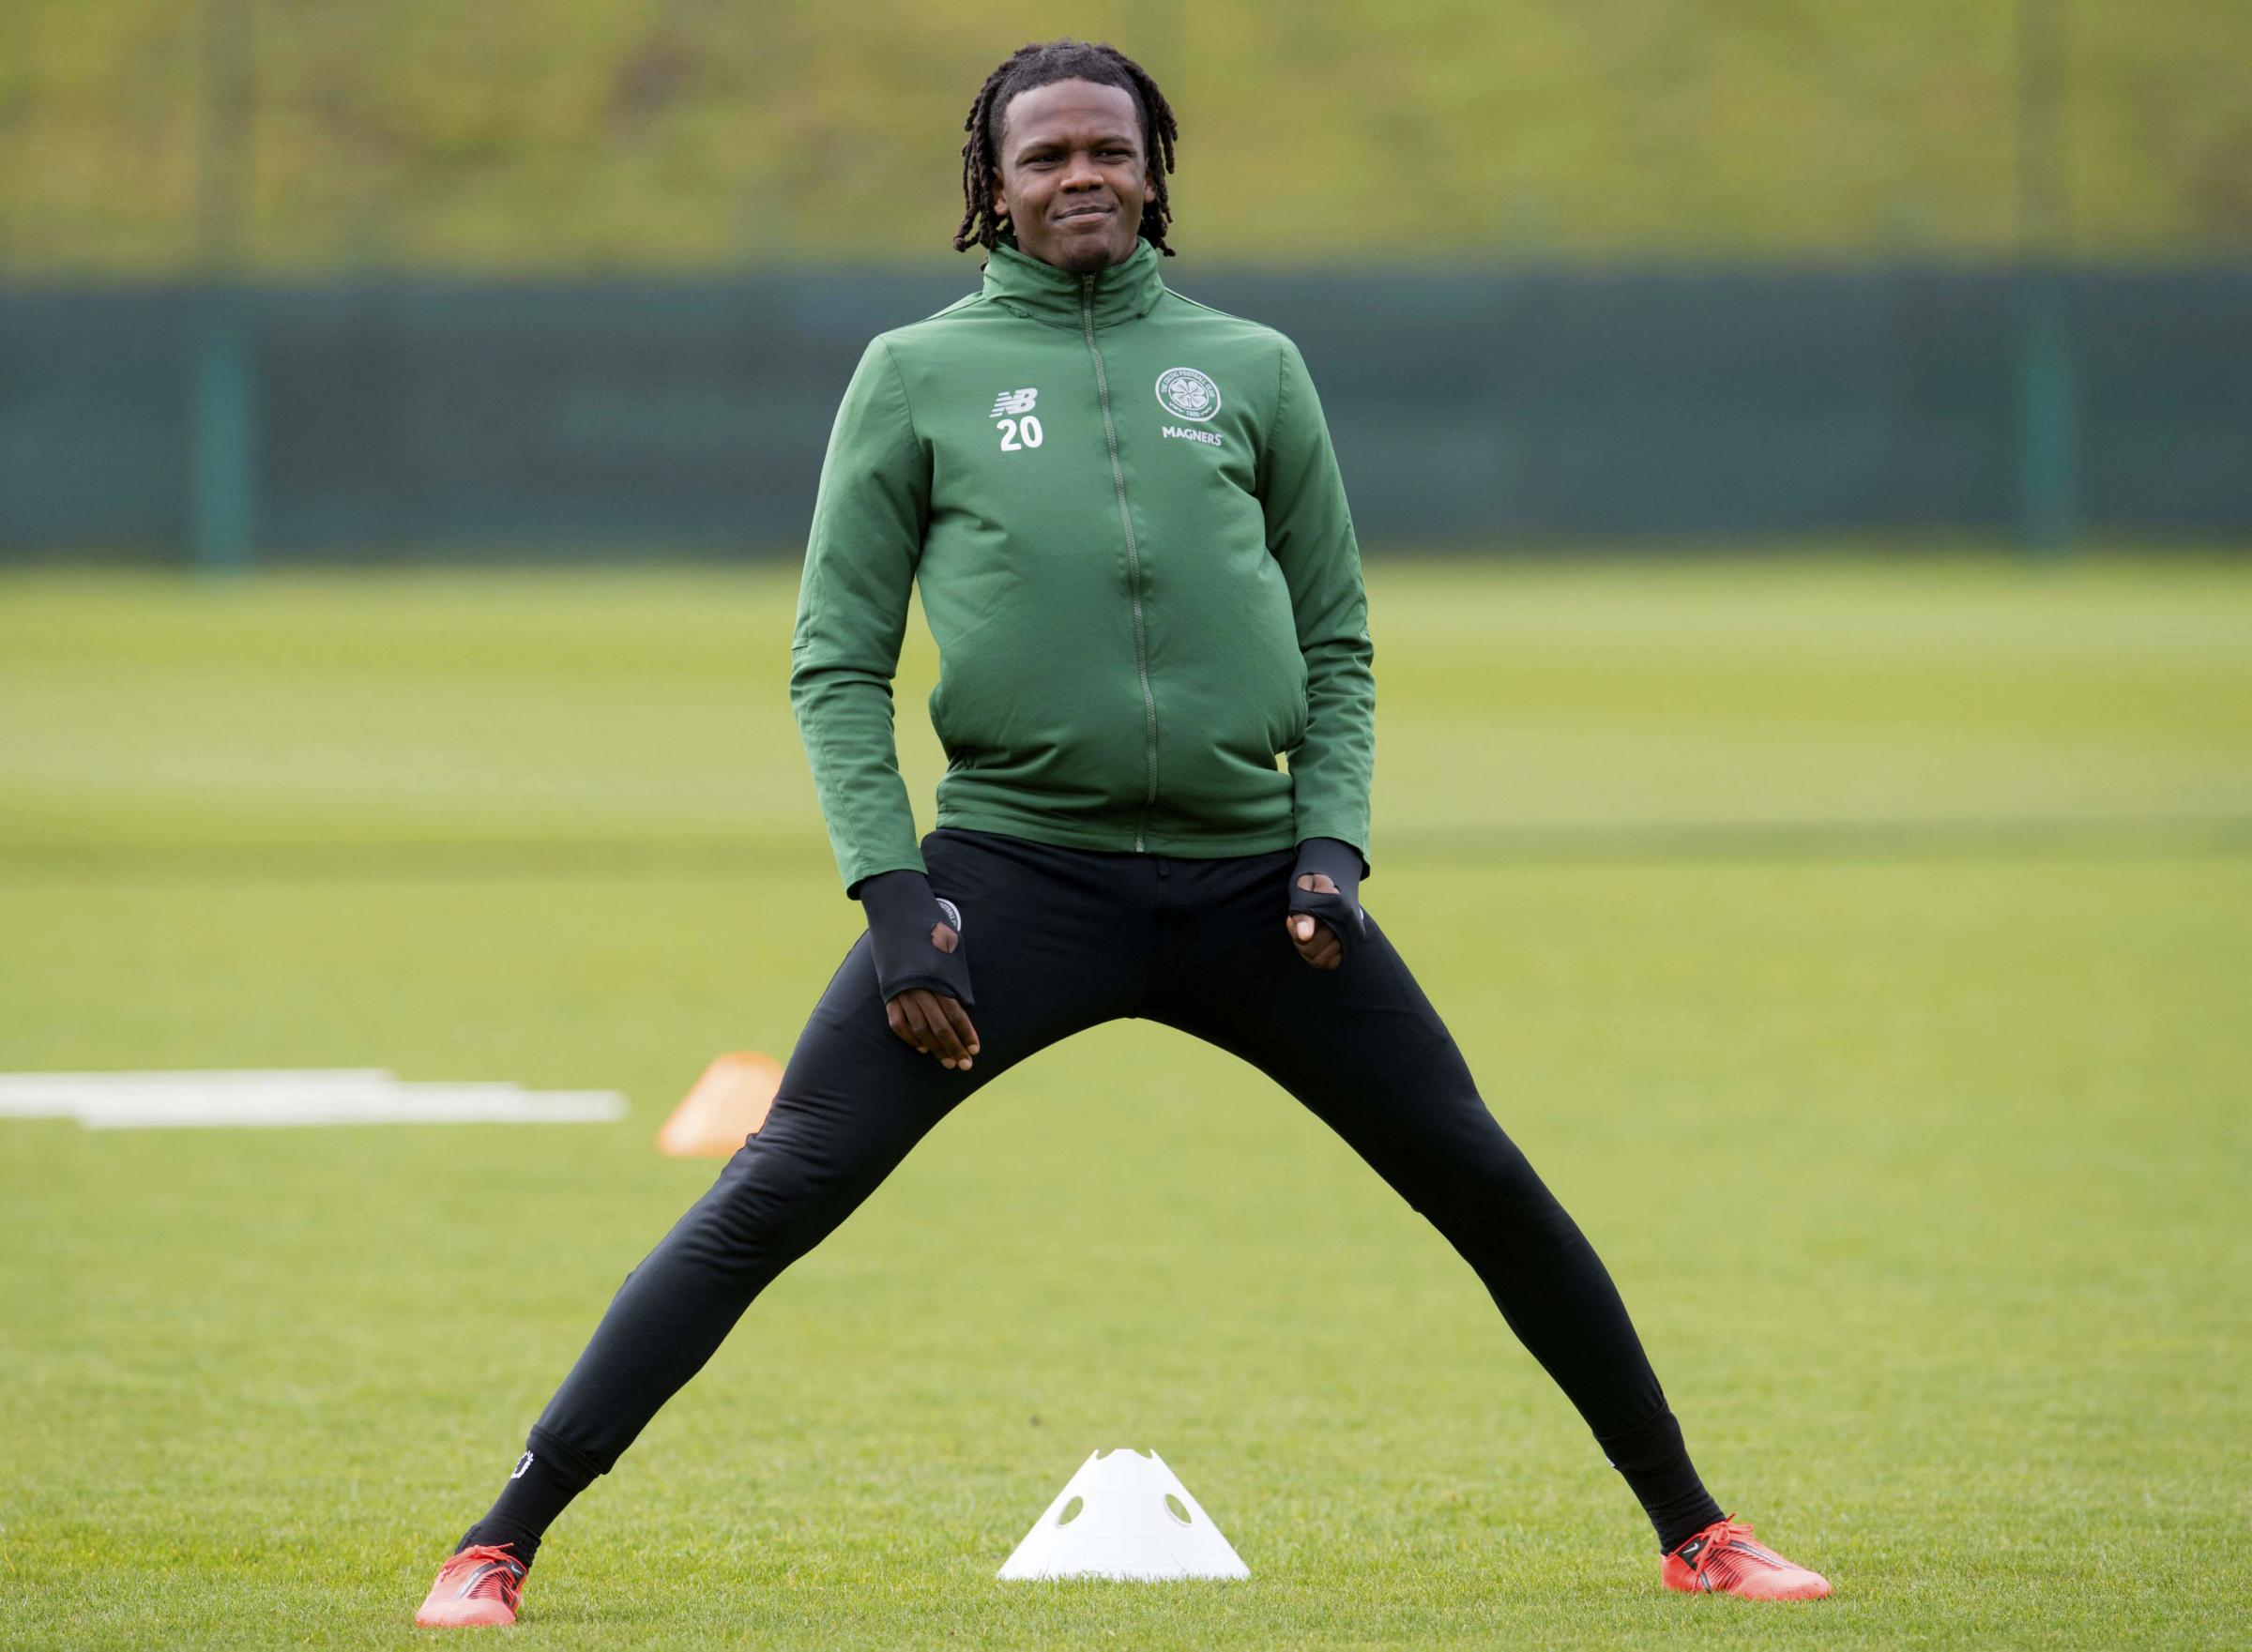 Hertha Berlin confirm Celtic centre half Dedryck Boyata will